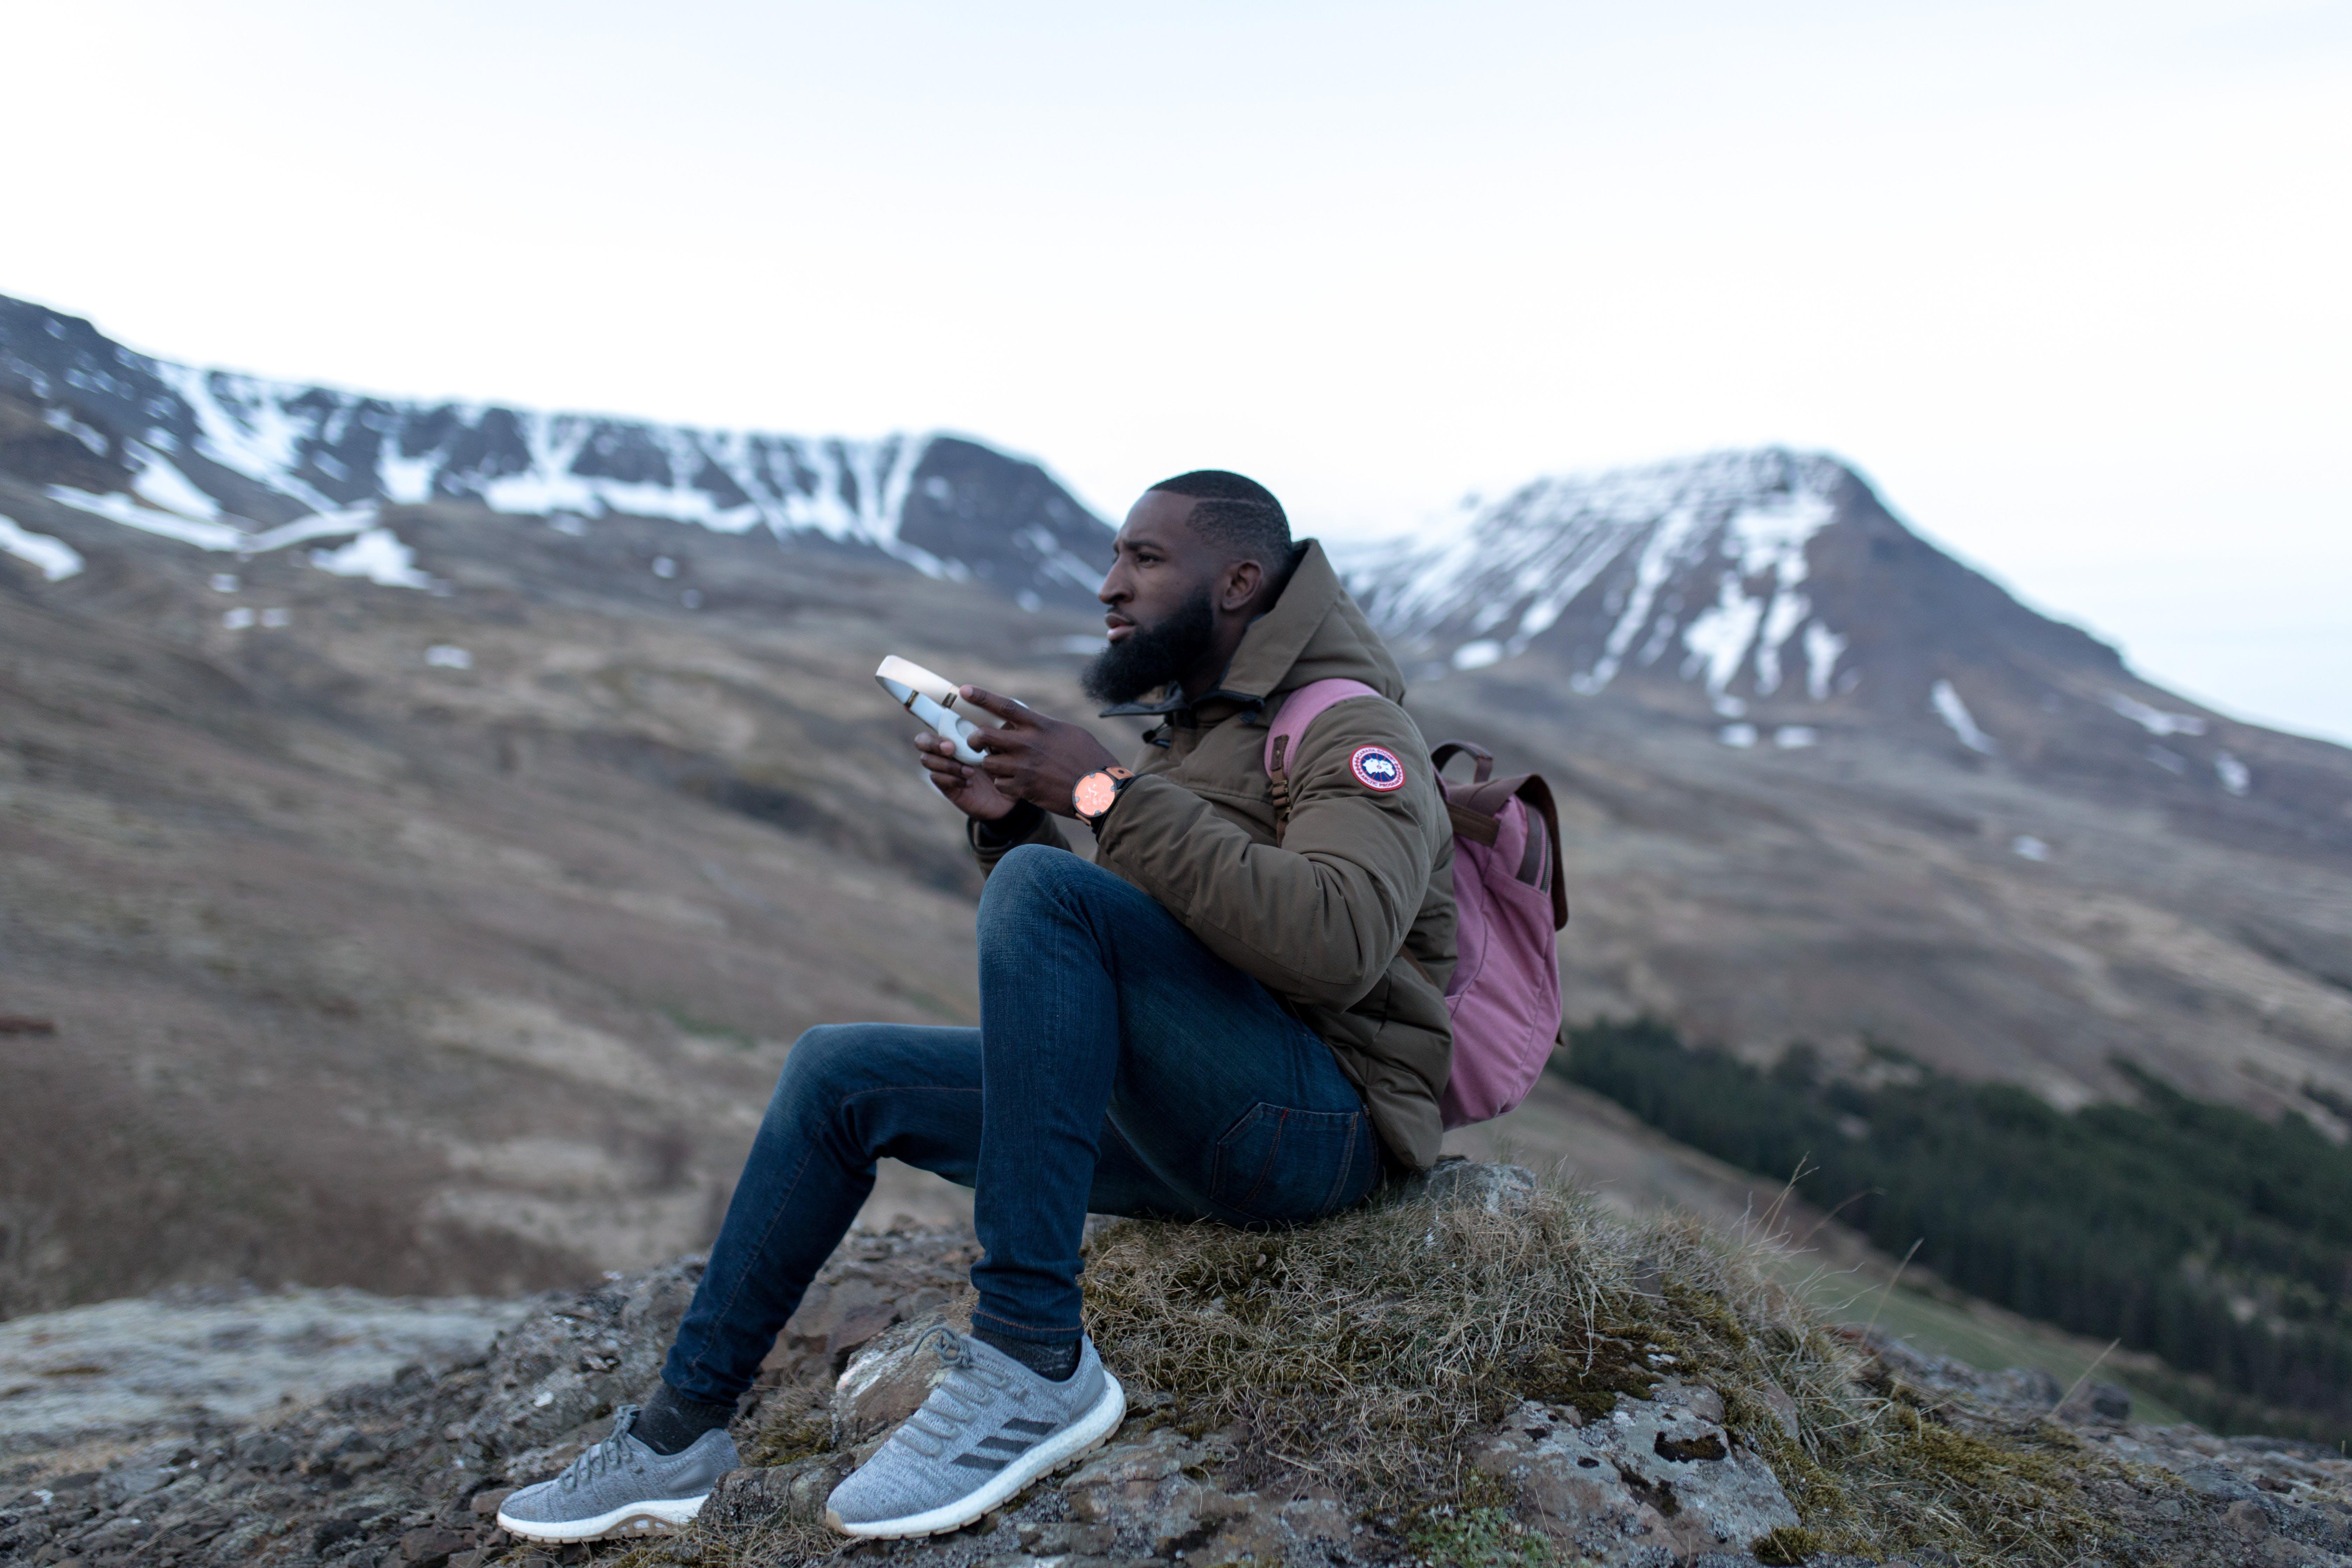 Man Wearing Brown Jacket and Blue Pants Sitting on Green Grass Holding Rectangular Case